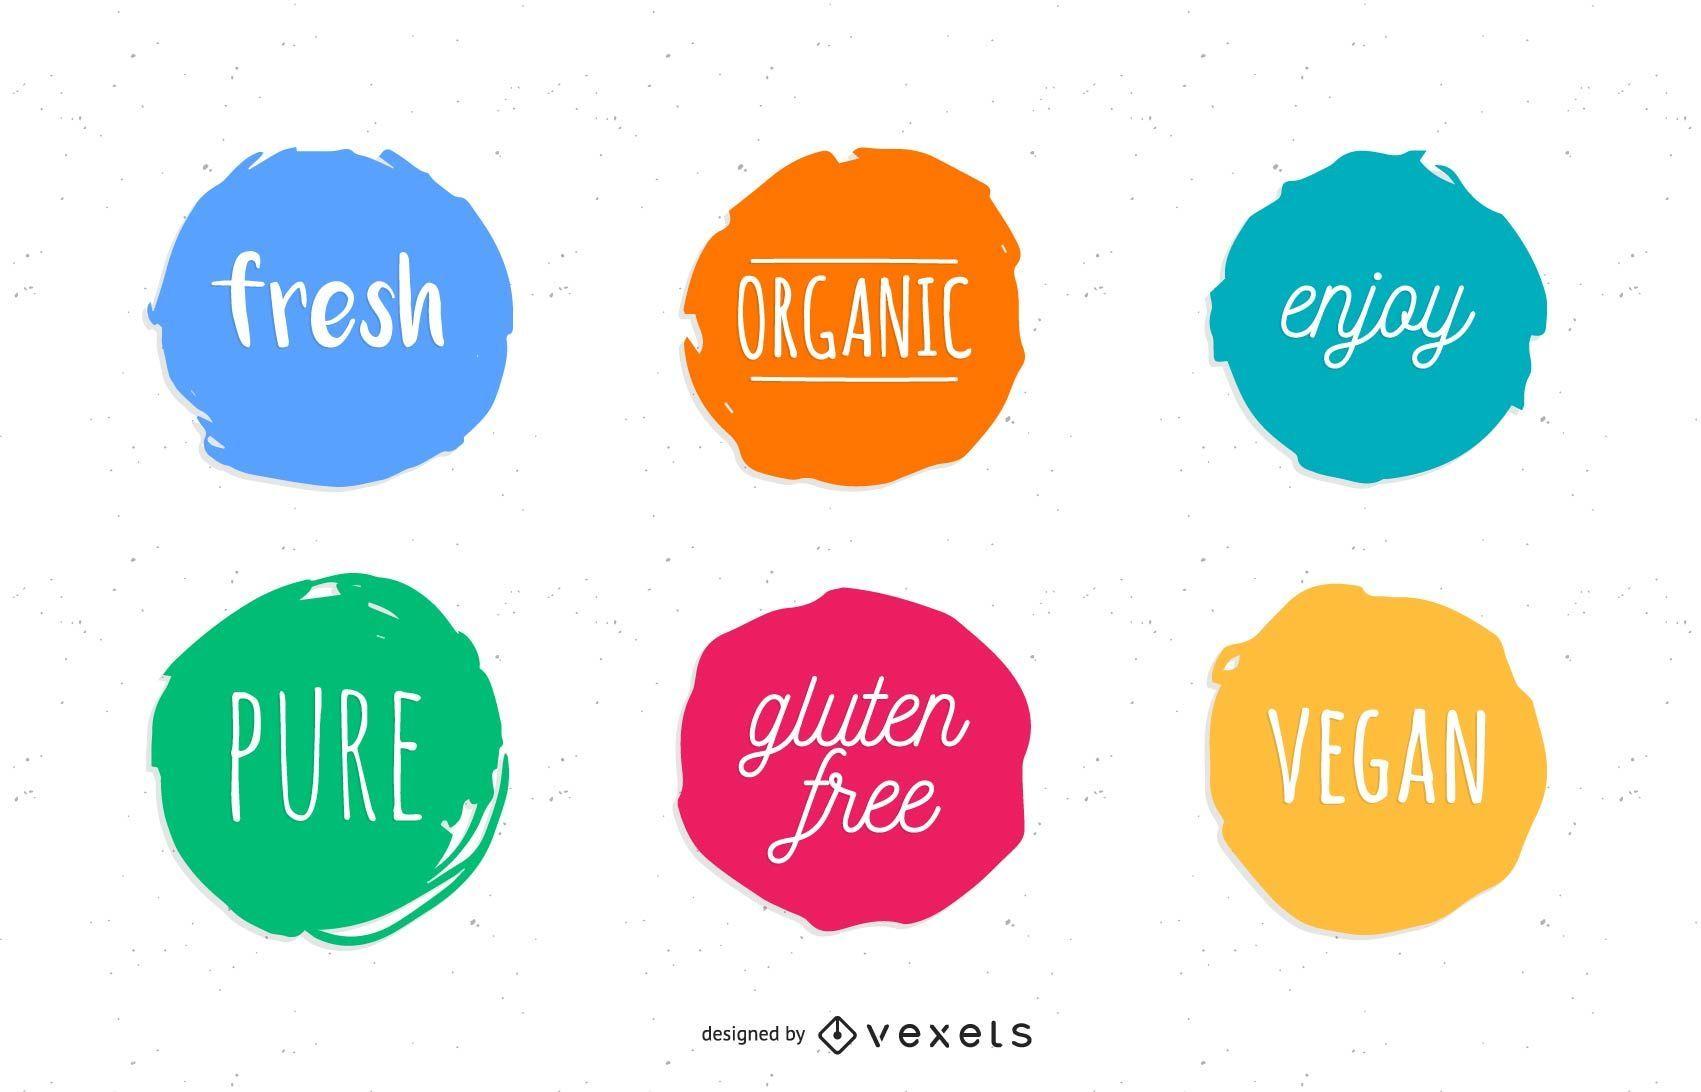 Gesunde Lebensmittelkreise gesetzt